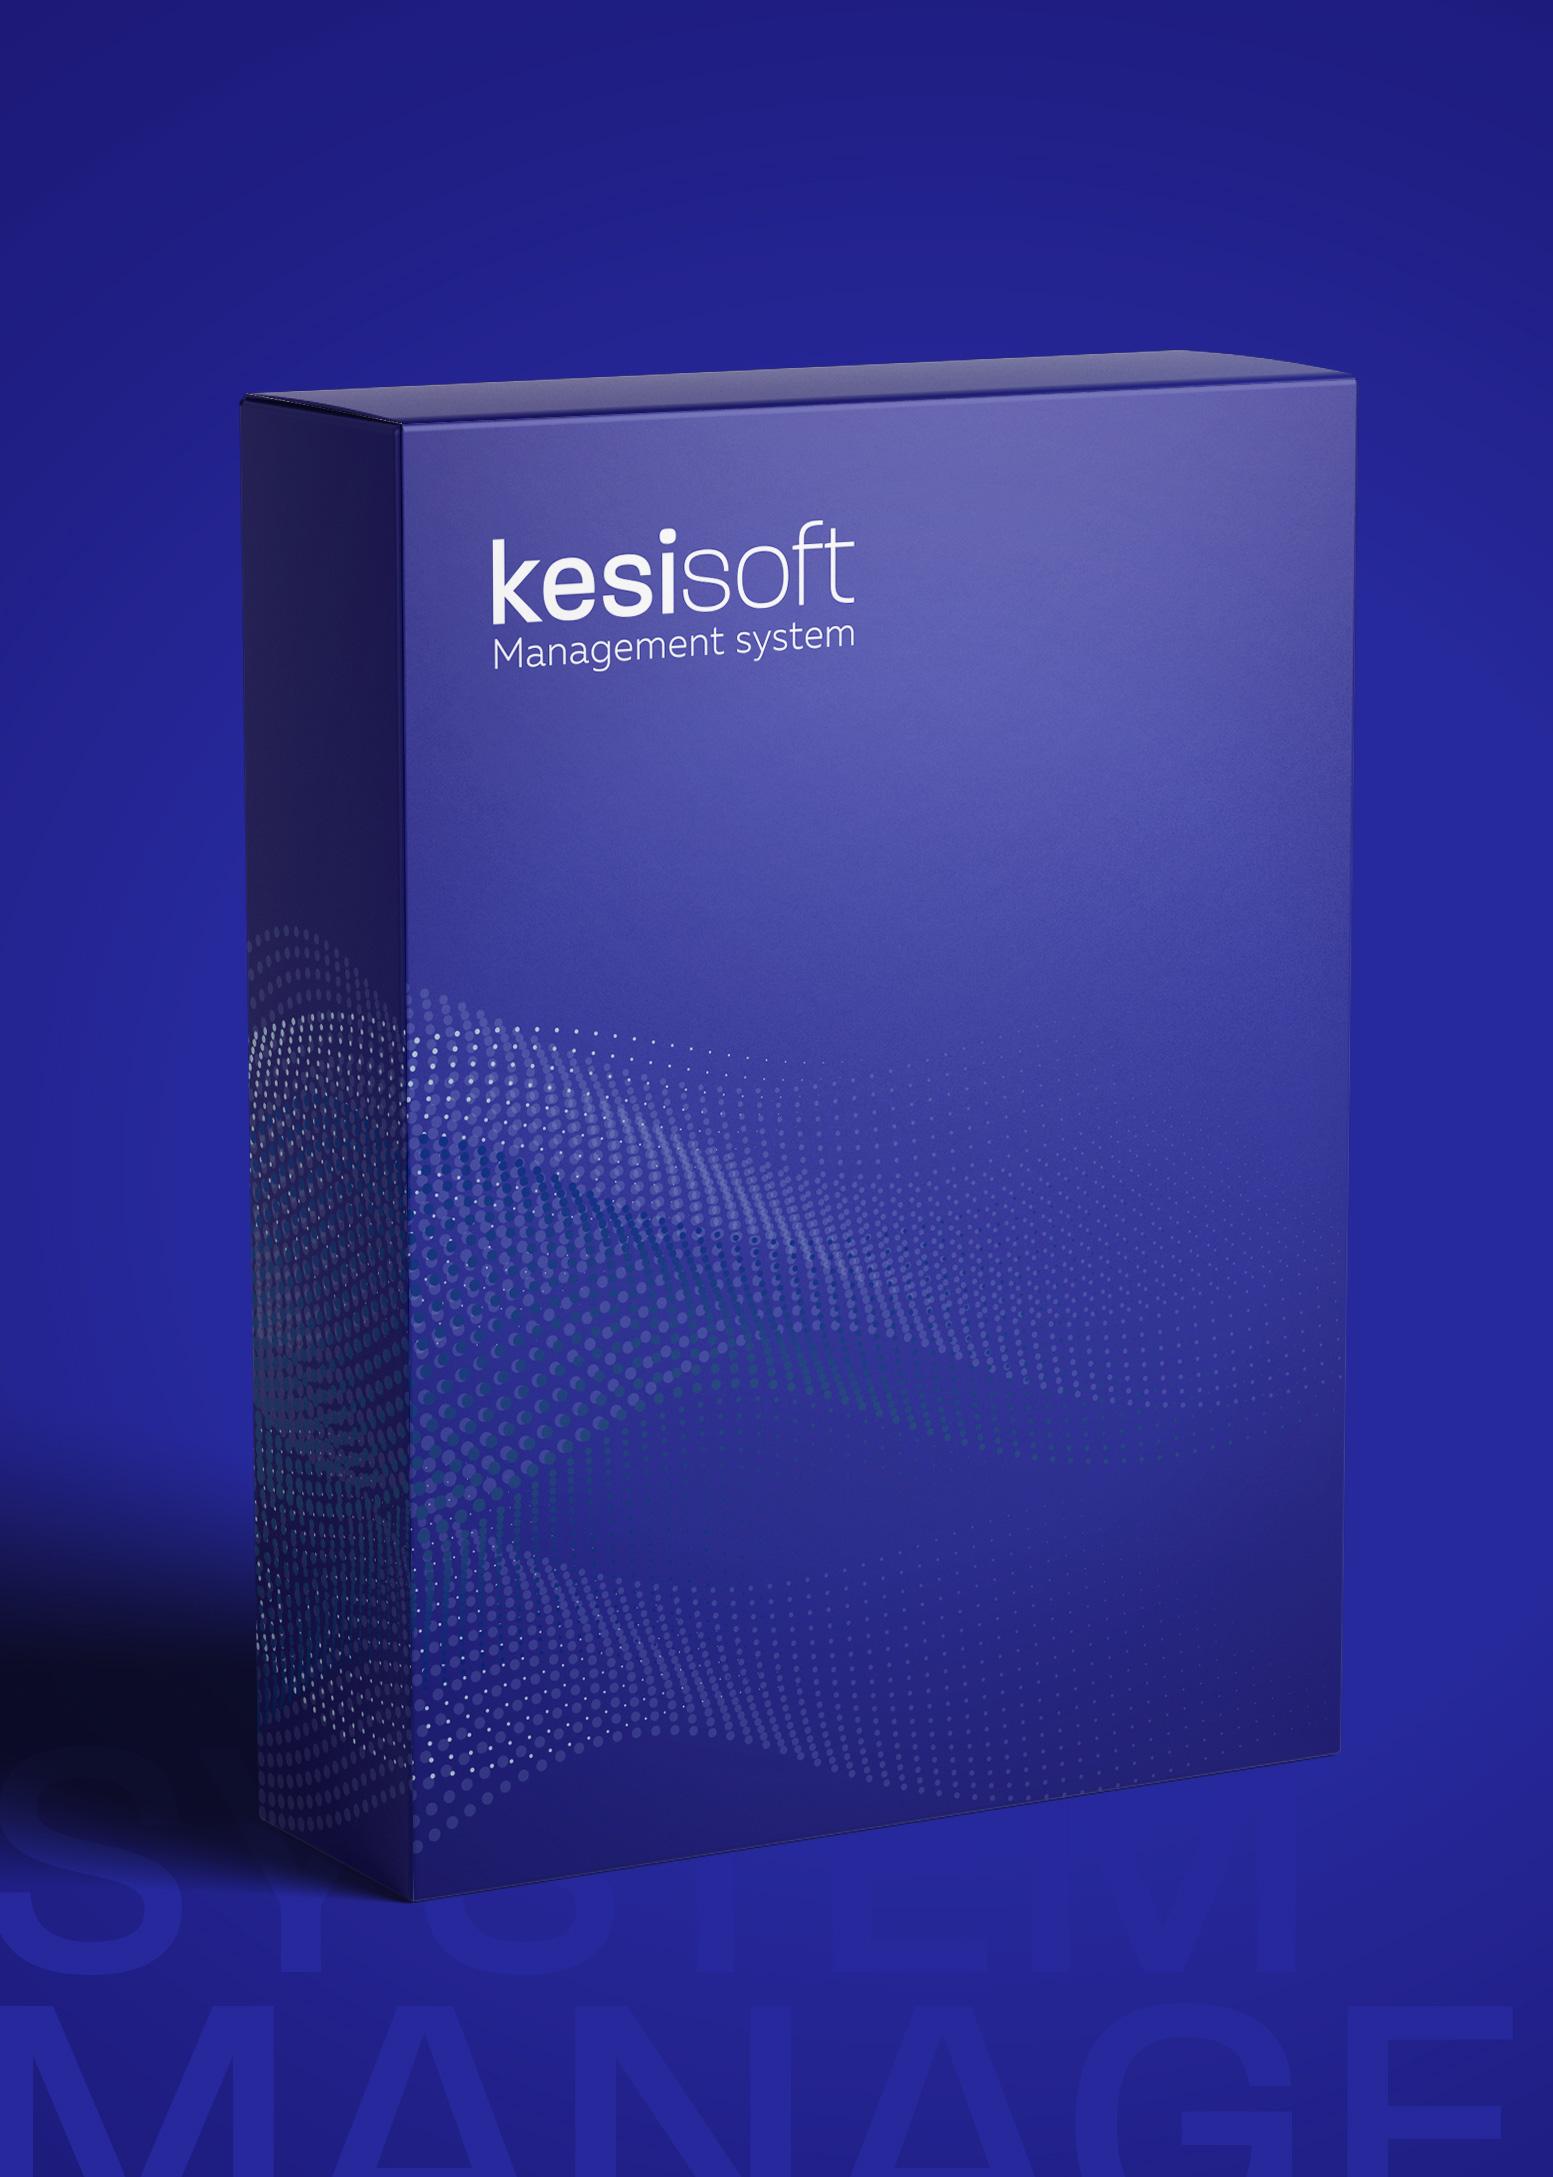 Kesisoft – Management System